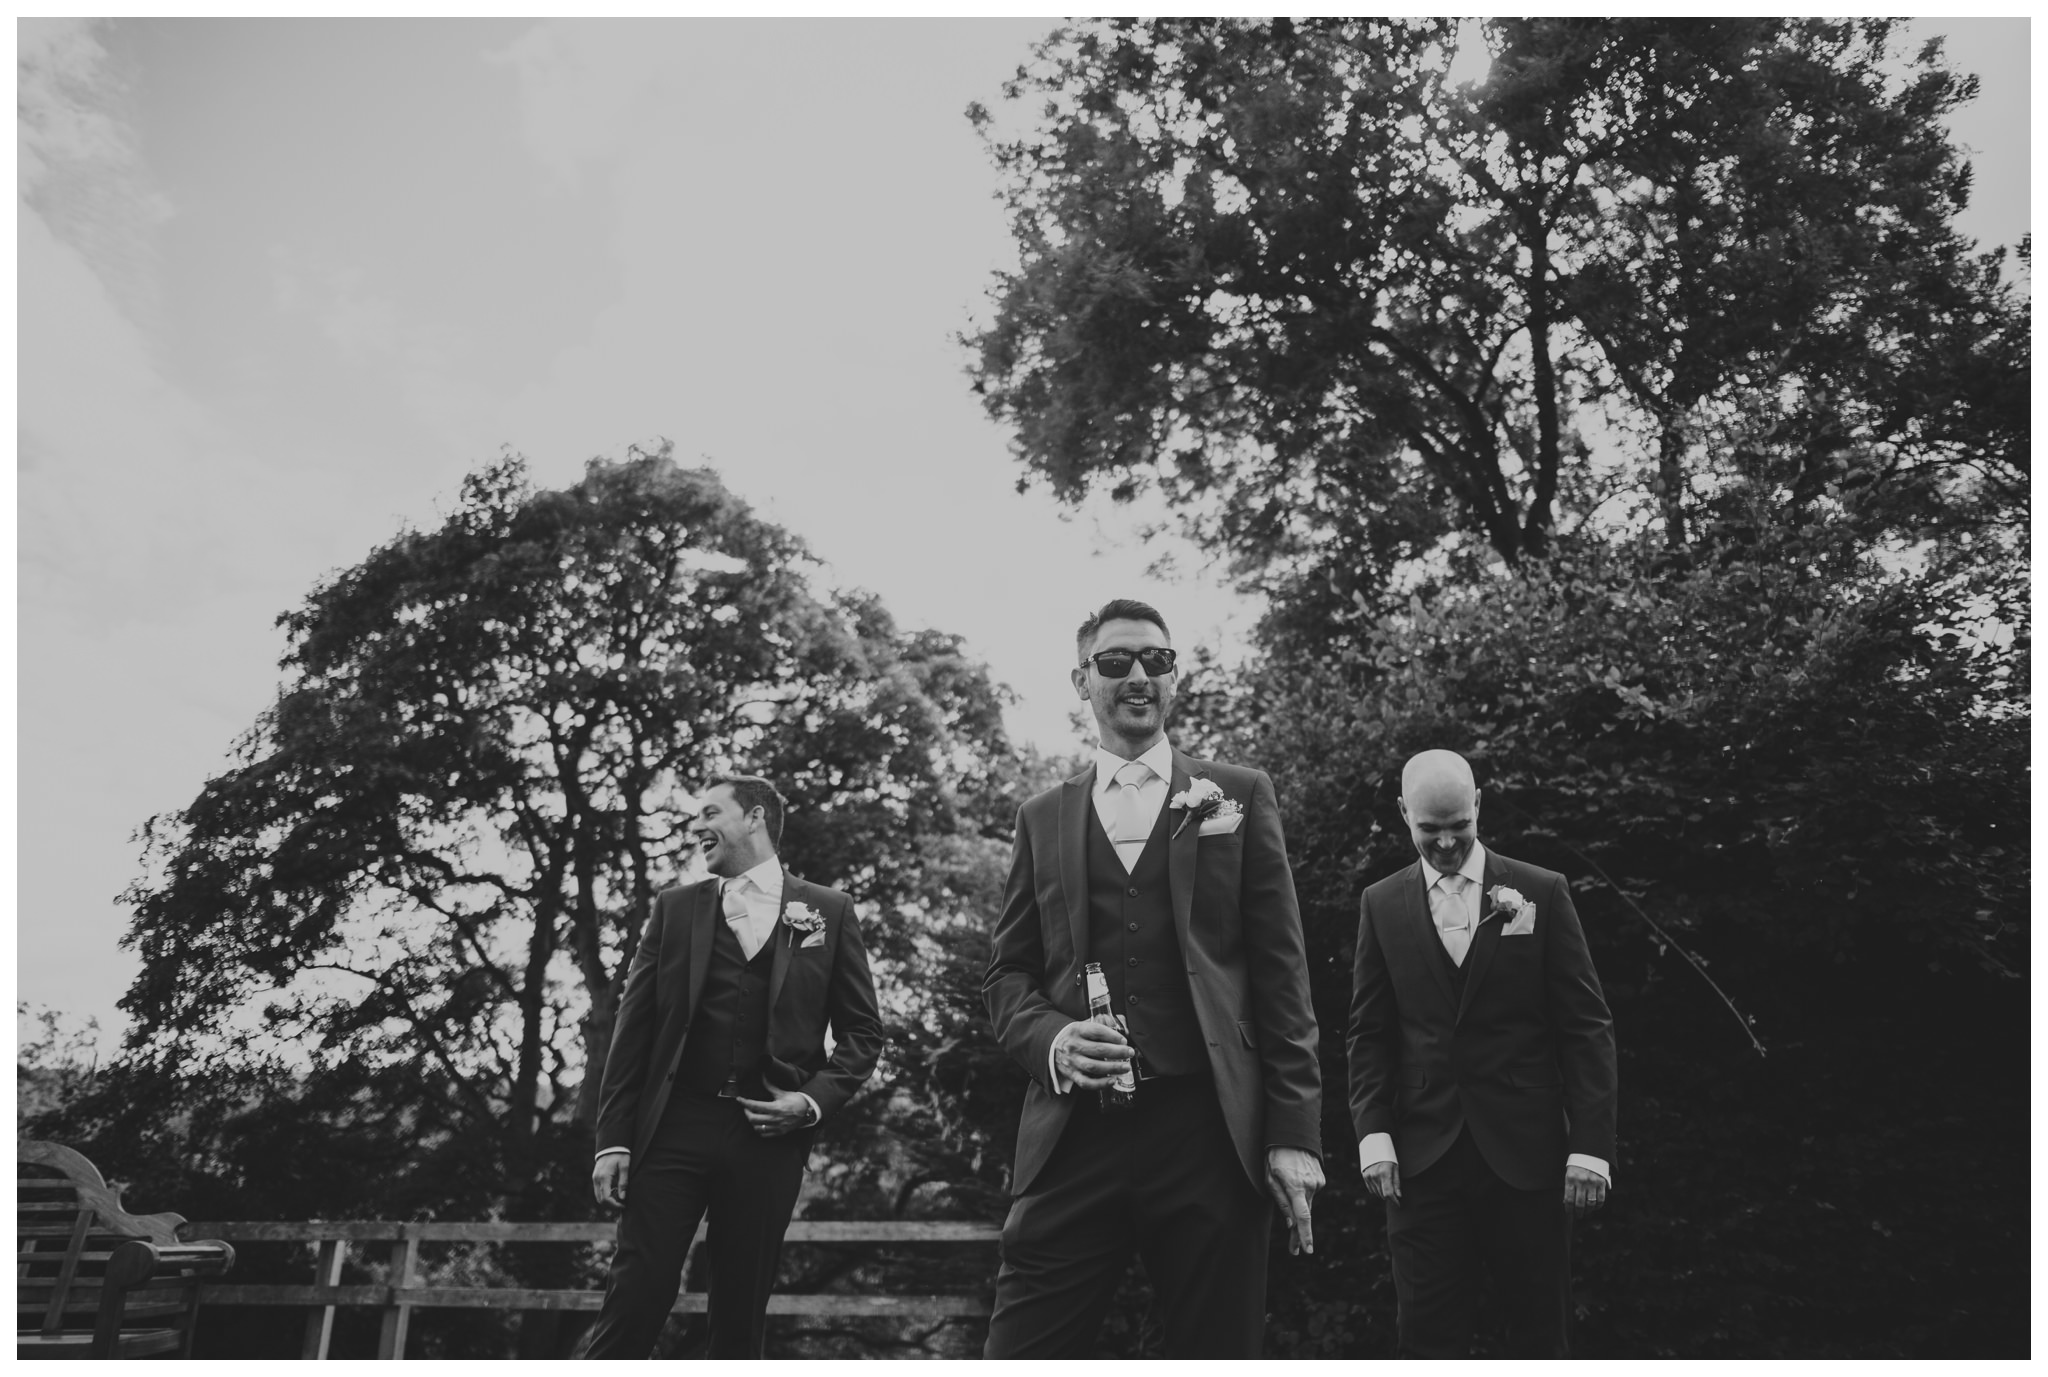 Richard Savage Photography - Wedding - Peterstone Court Brecon - 2016-05-11_0039